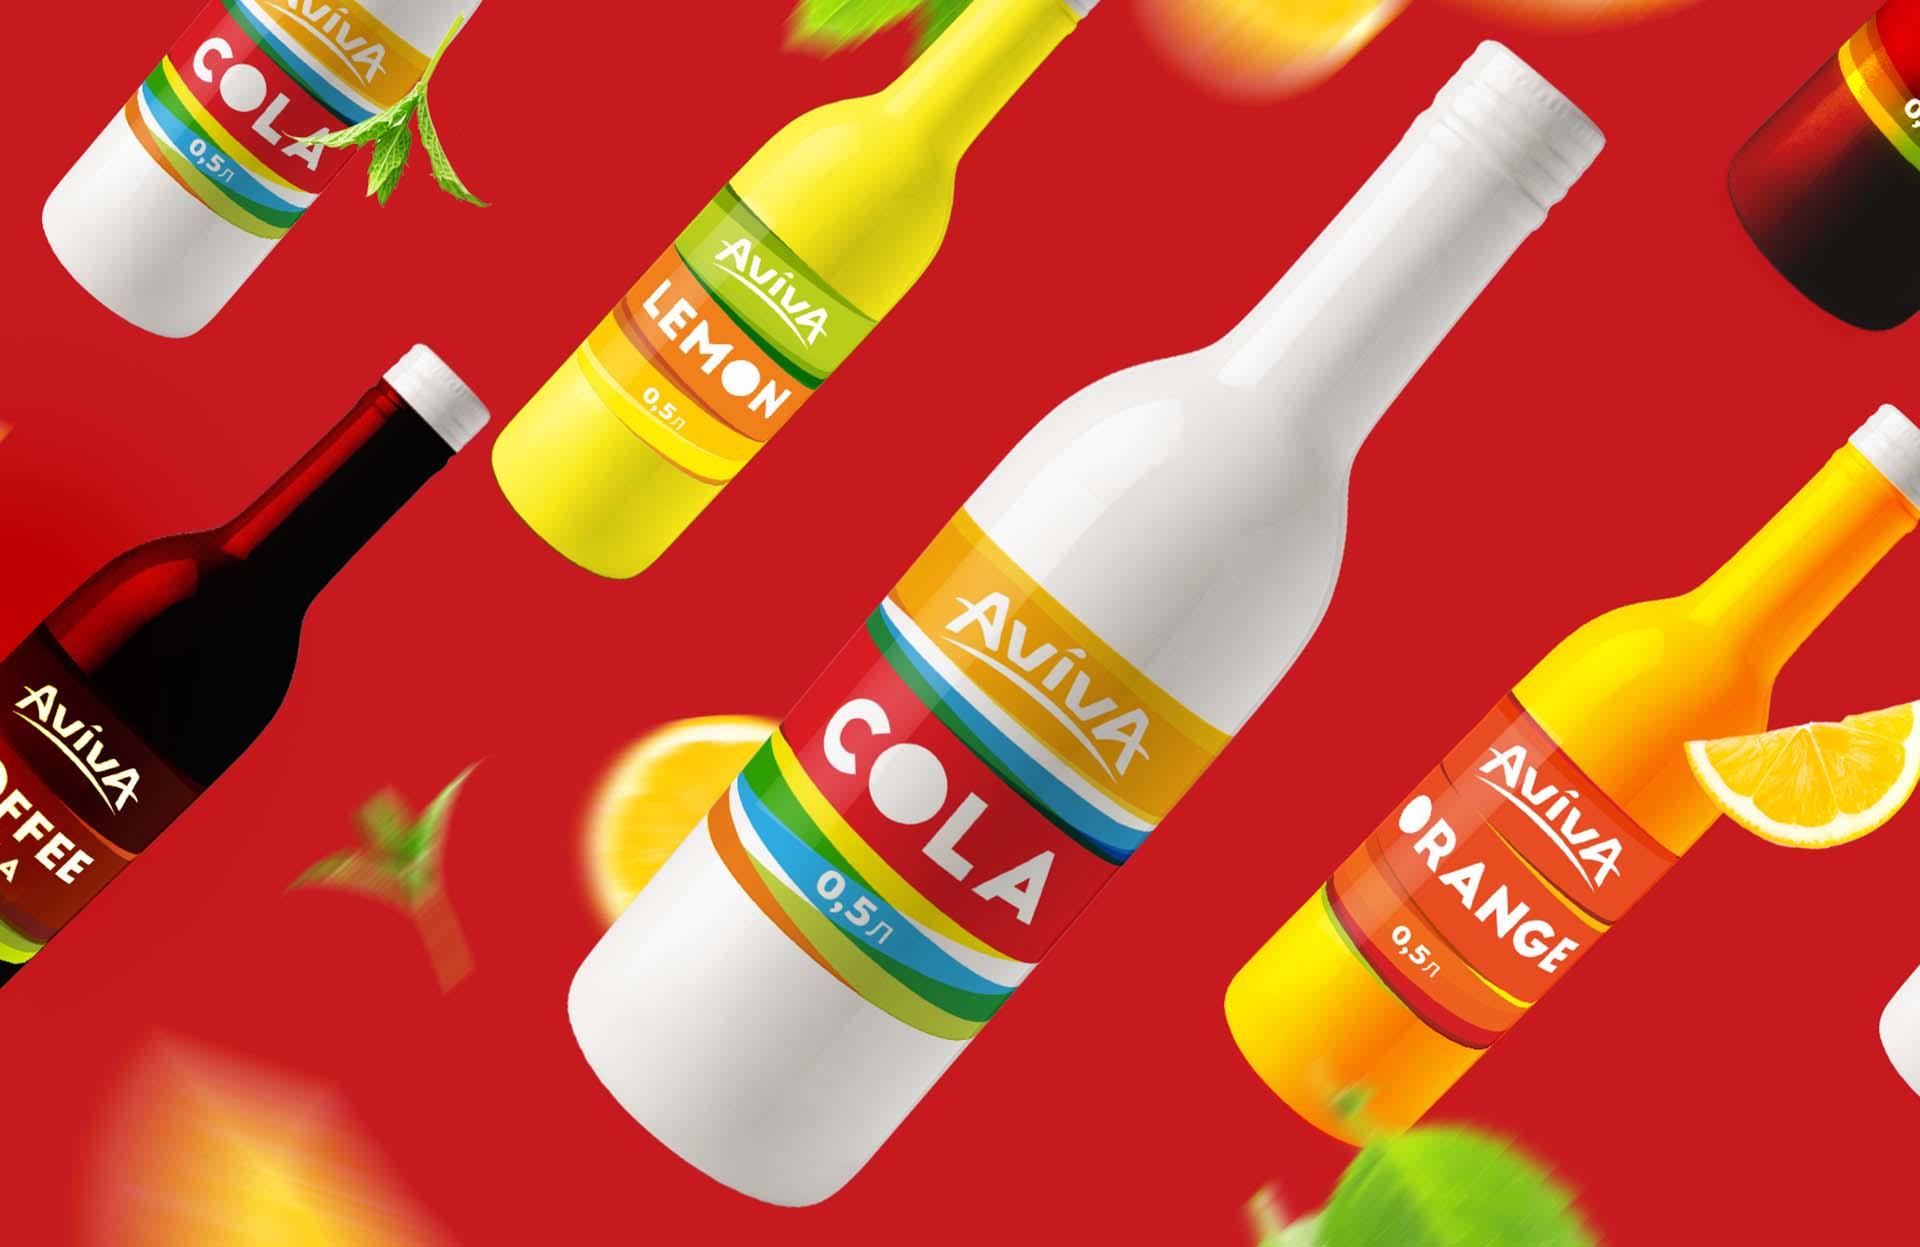 Дизайн этикетки Coca Cola Aviva